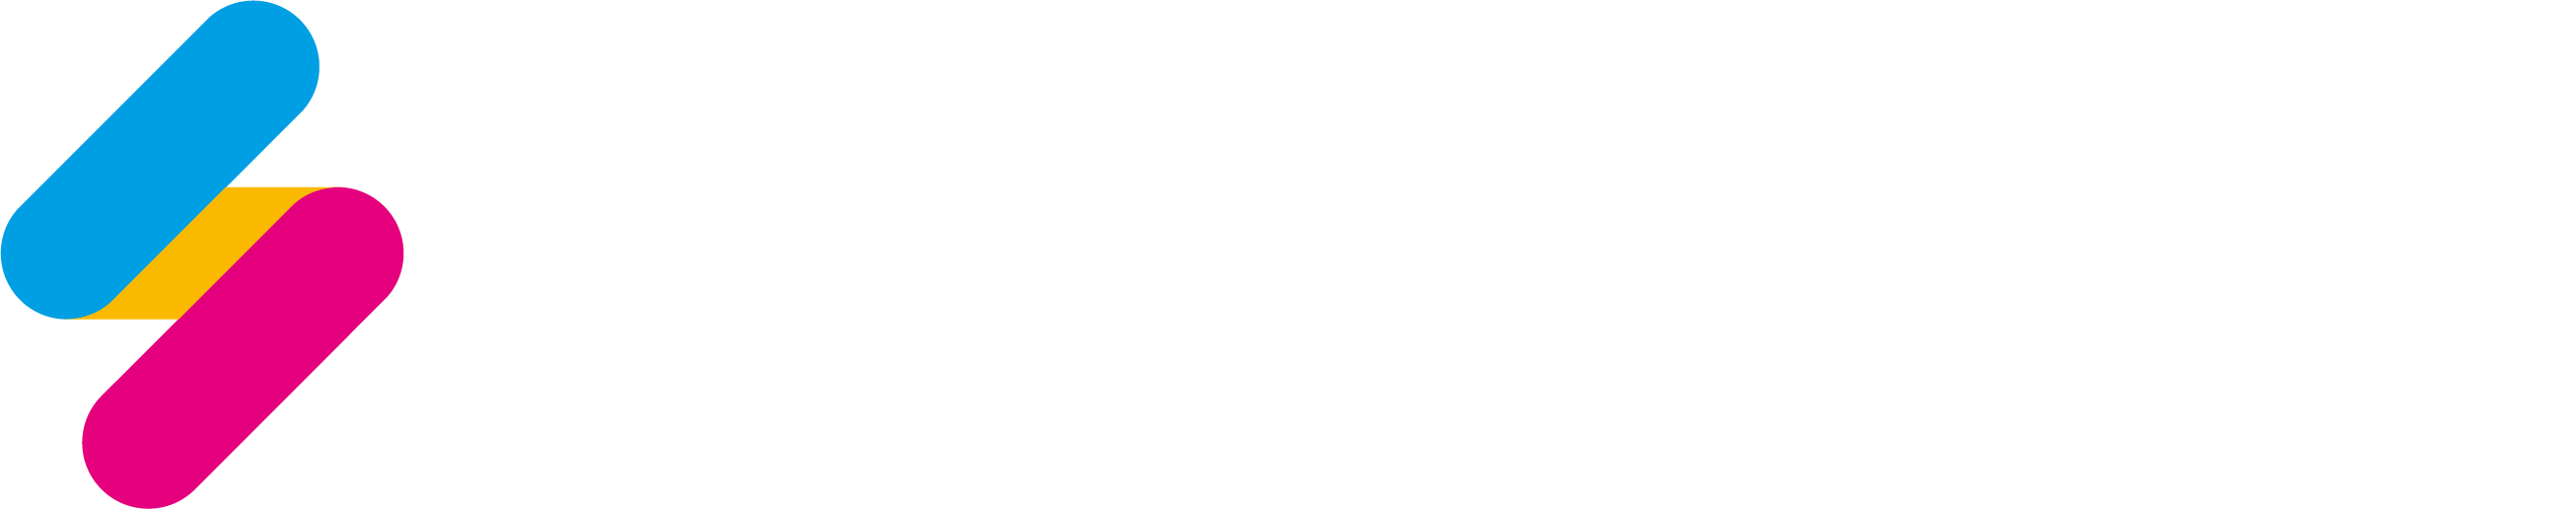 Synergy Learning Reversal RGB